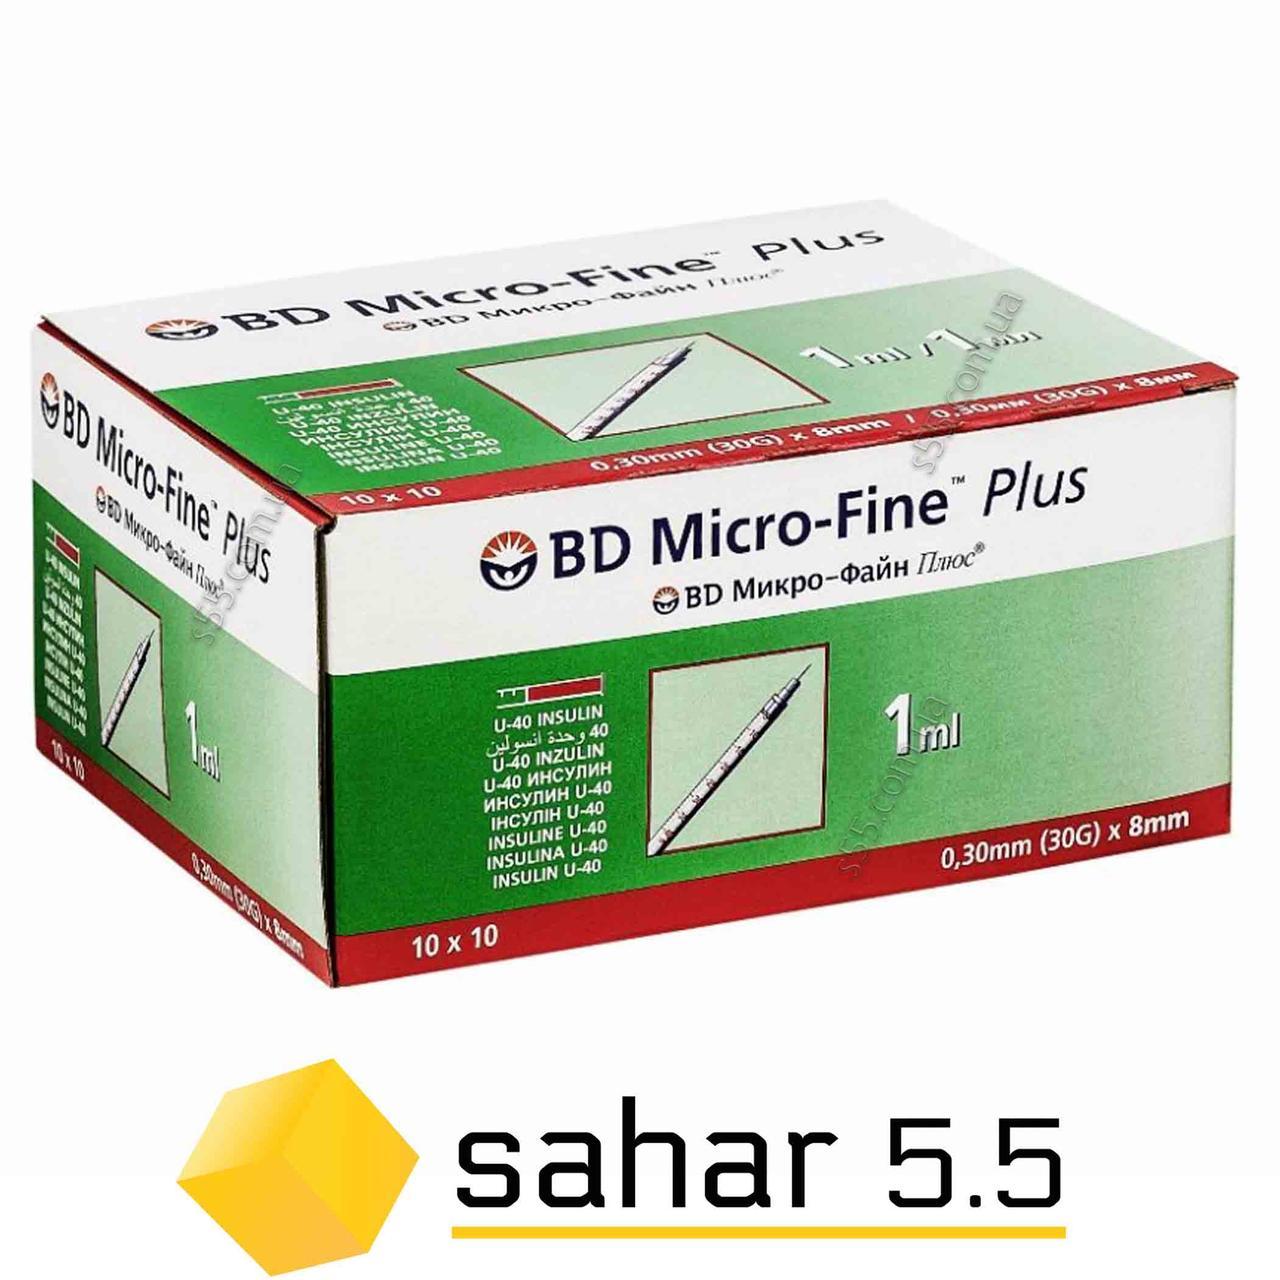 Шприц инсулиновый U-40 БД Микро-Файн Плюс 1ml (игла 8мм) - 100шт.